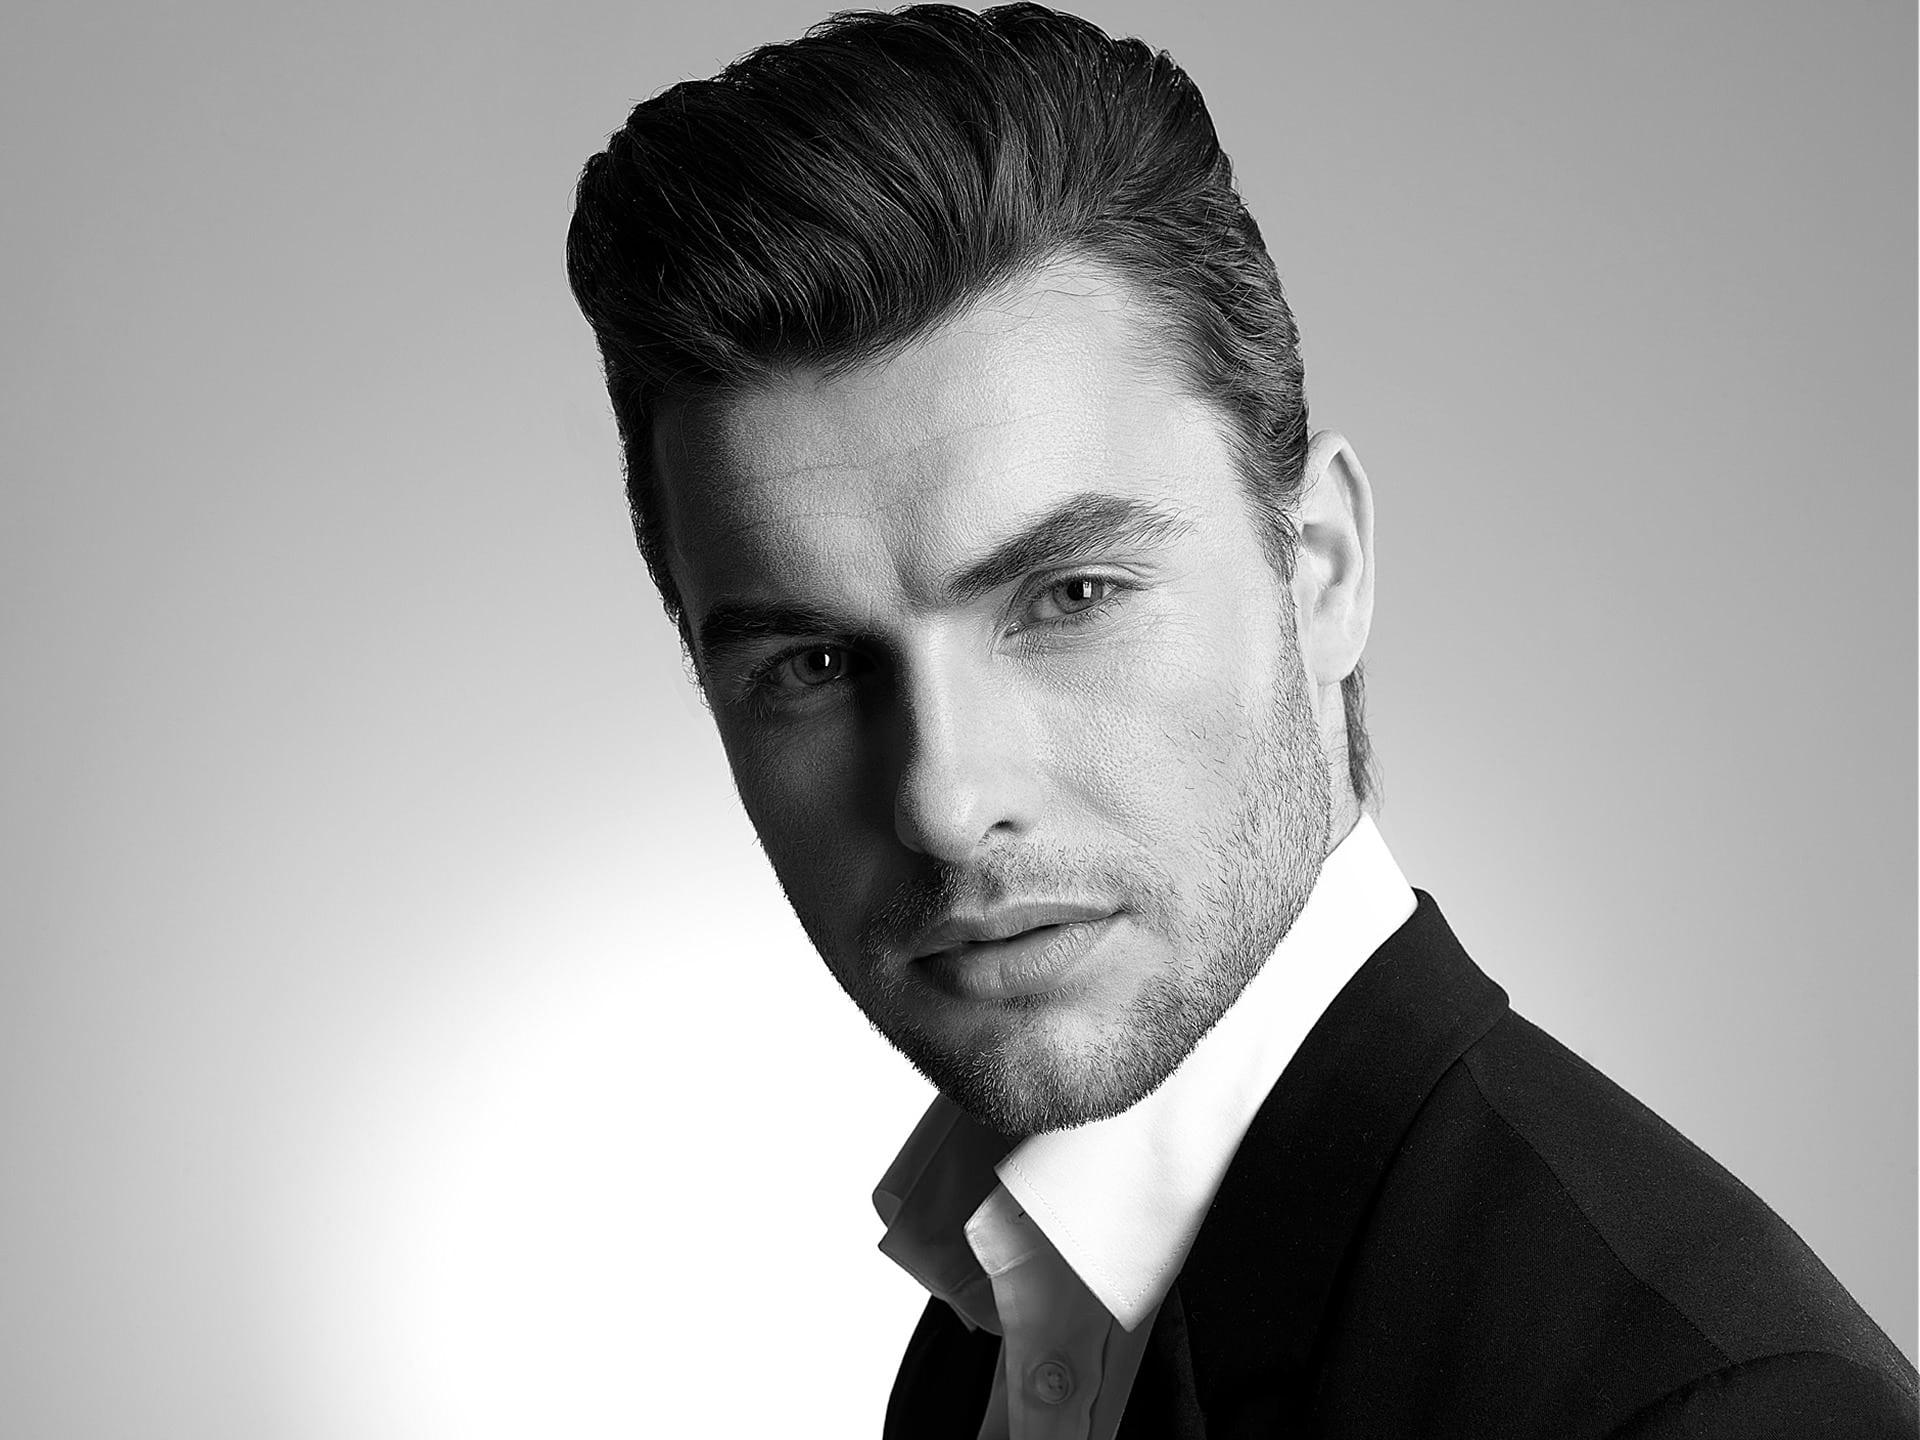 Men Haircut West Island Vibes Salon Spa